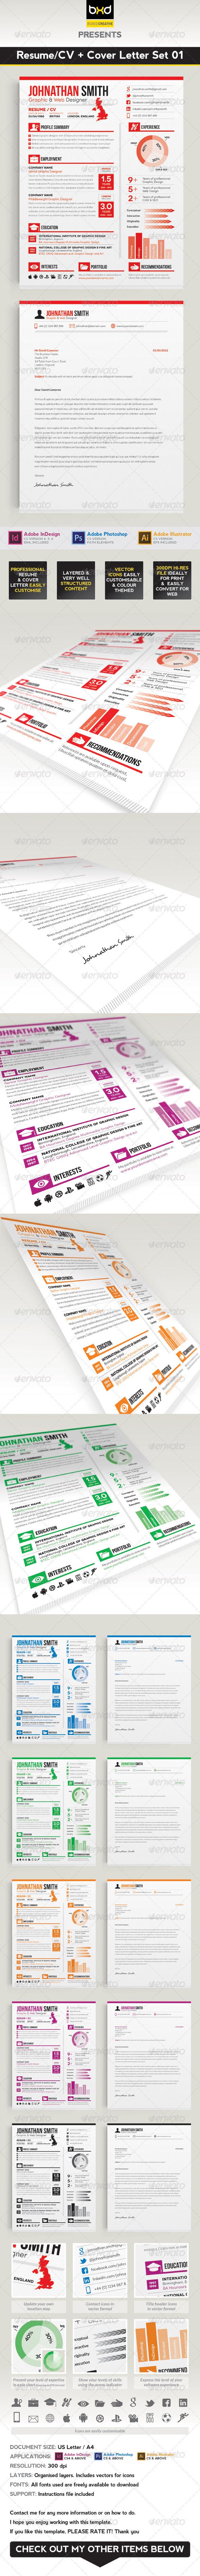 GraphicRiver Resume CV & Cover Letter Set 01 3435266